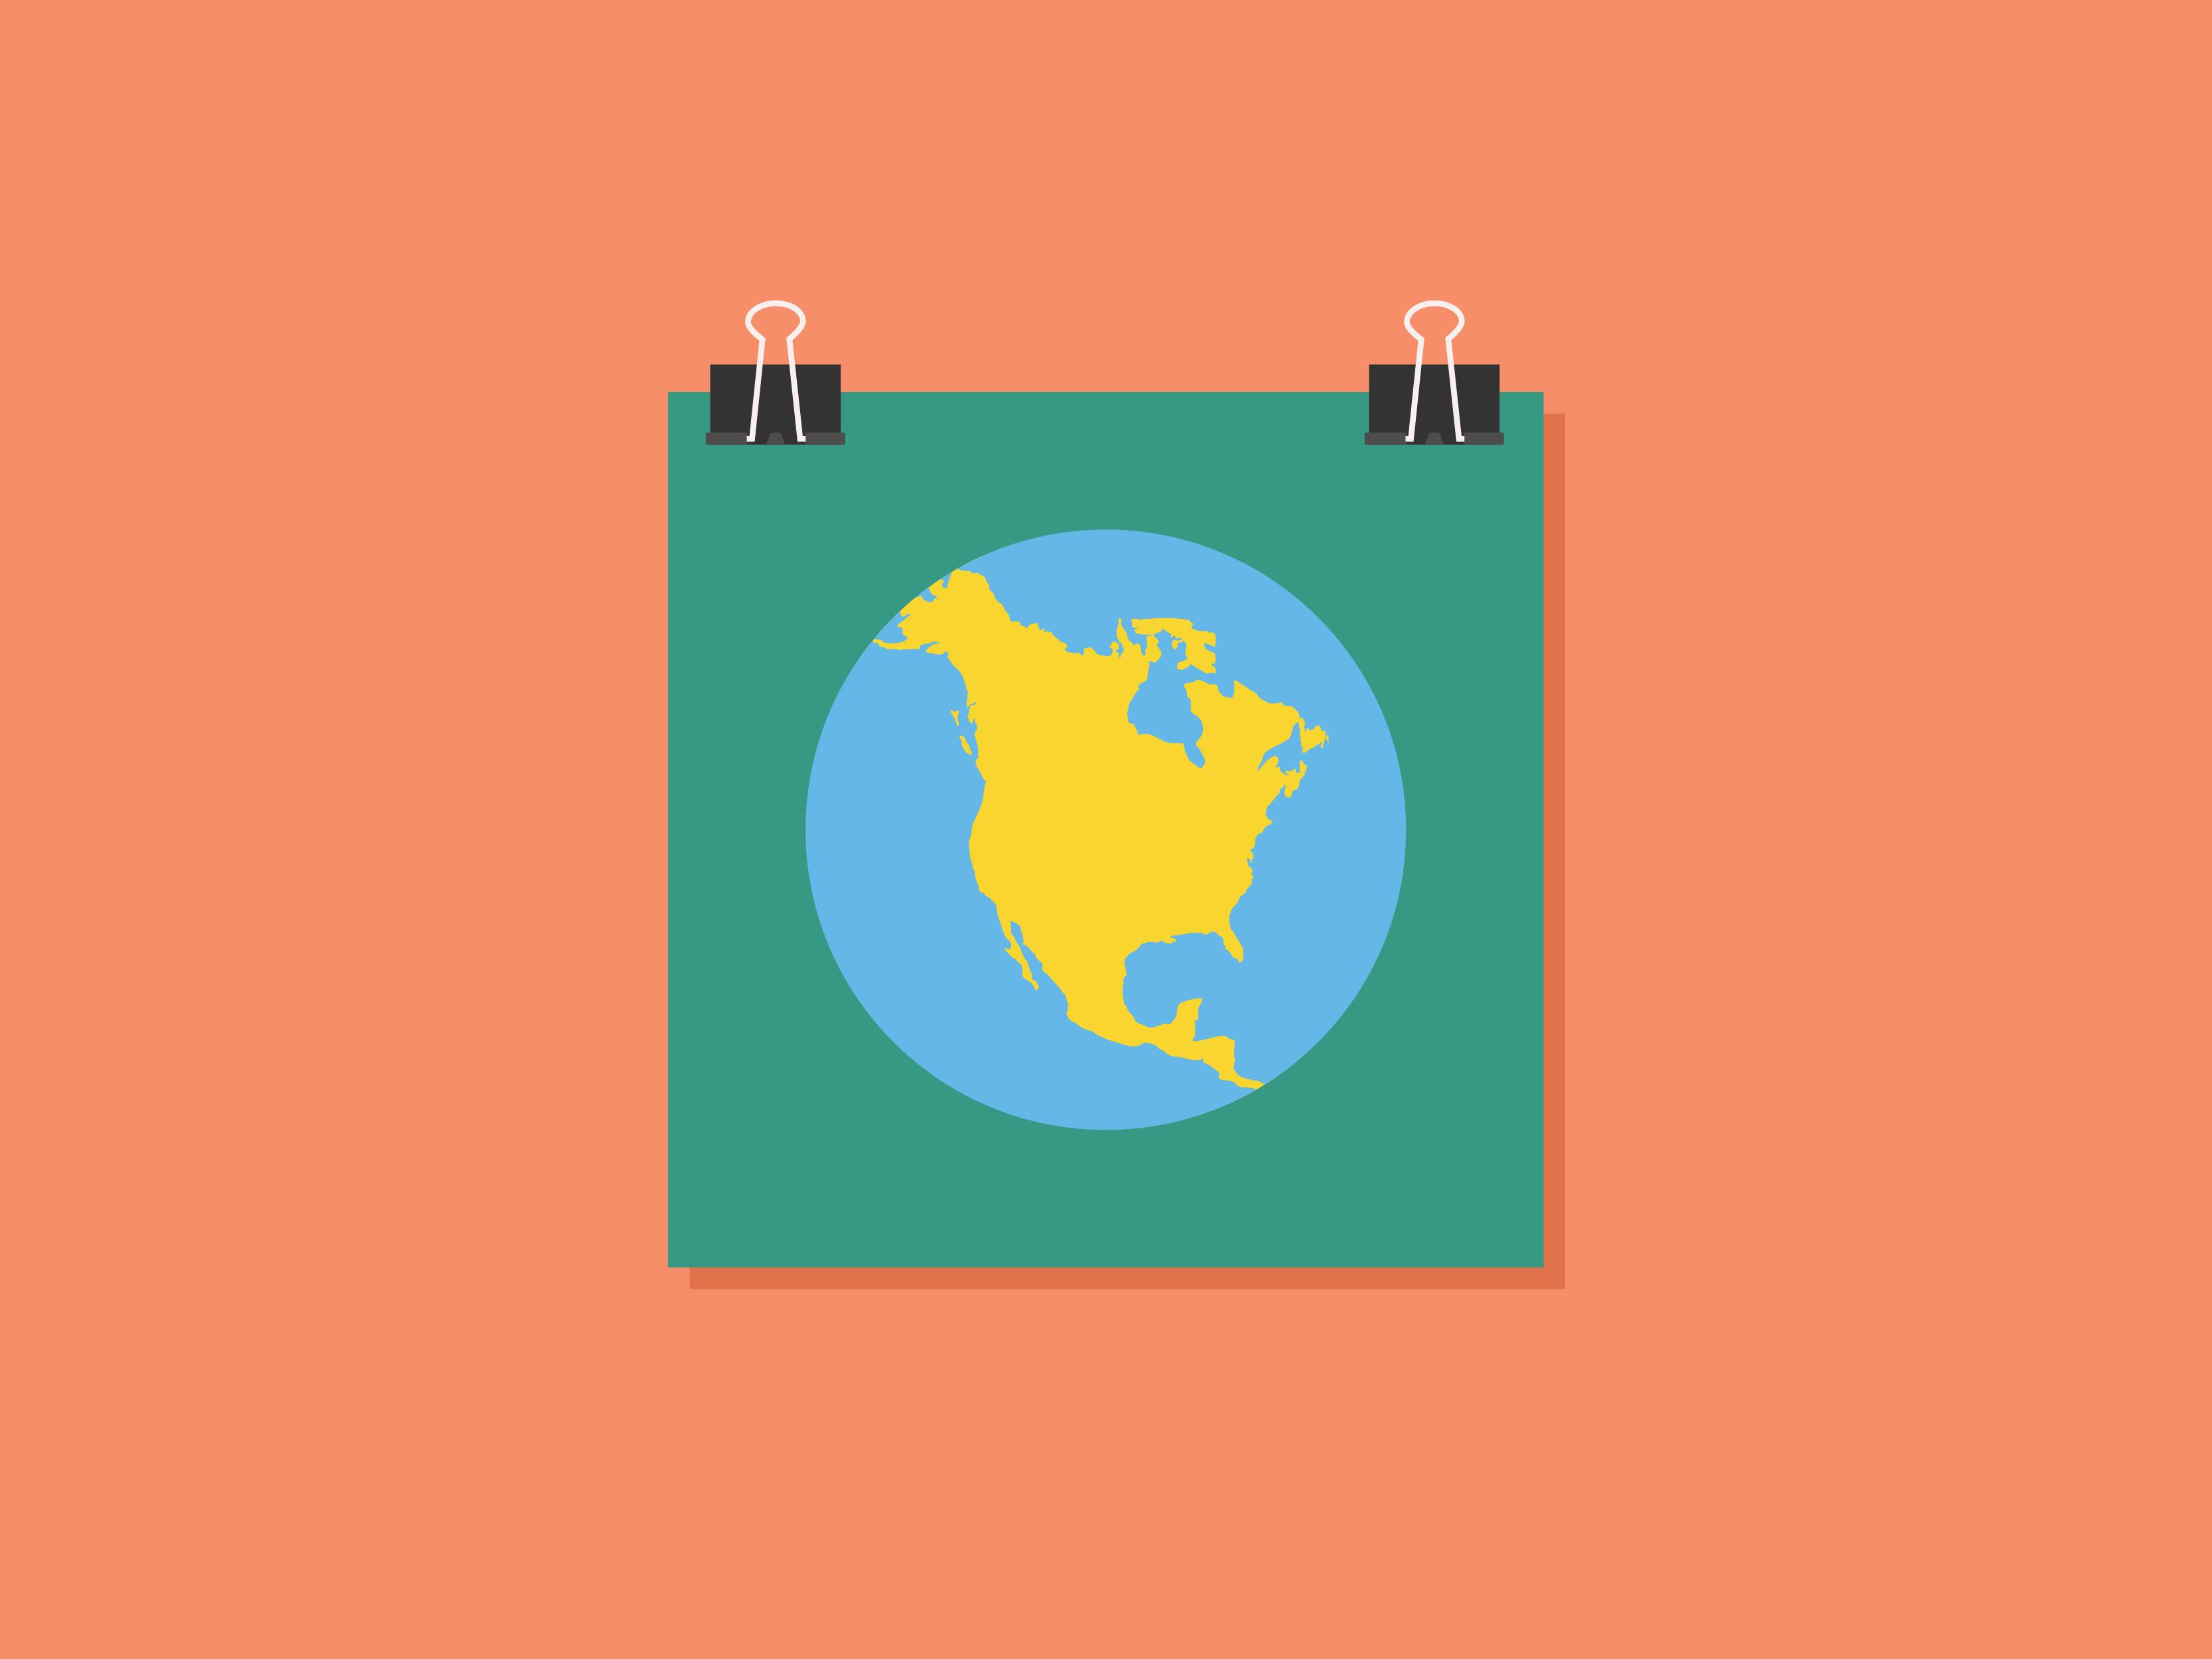 north america illustration for joyful literacy brand identity design